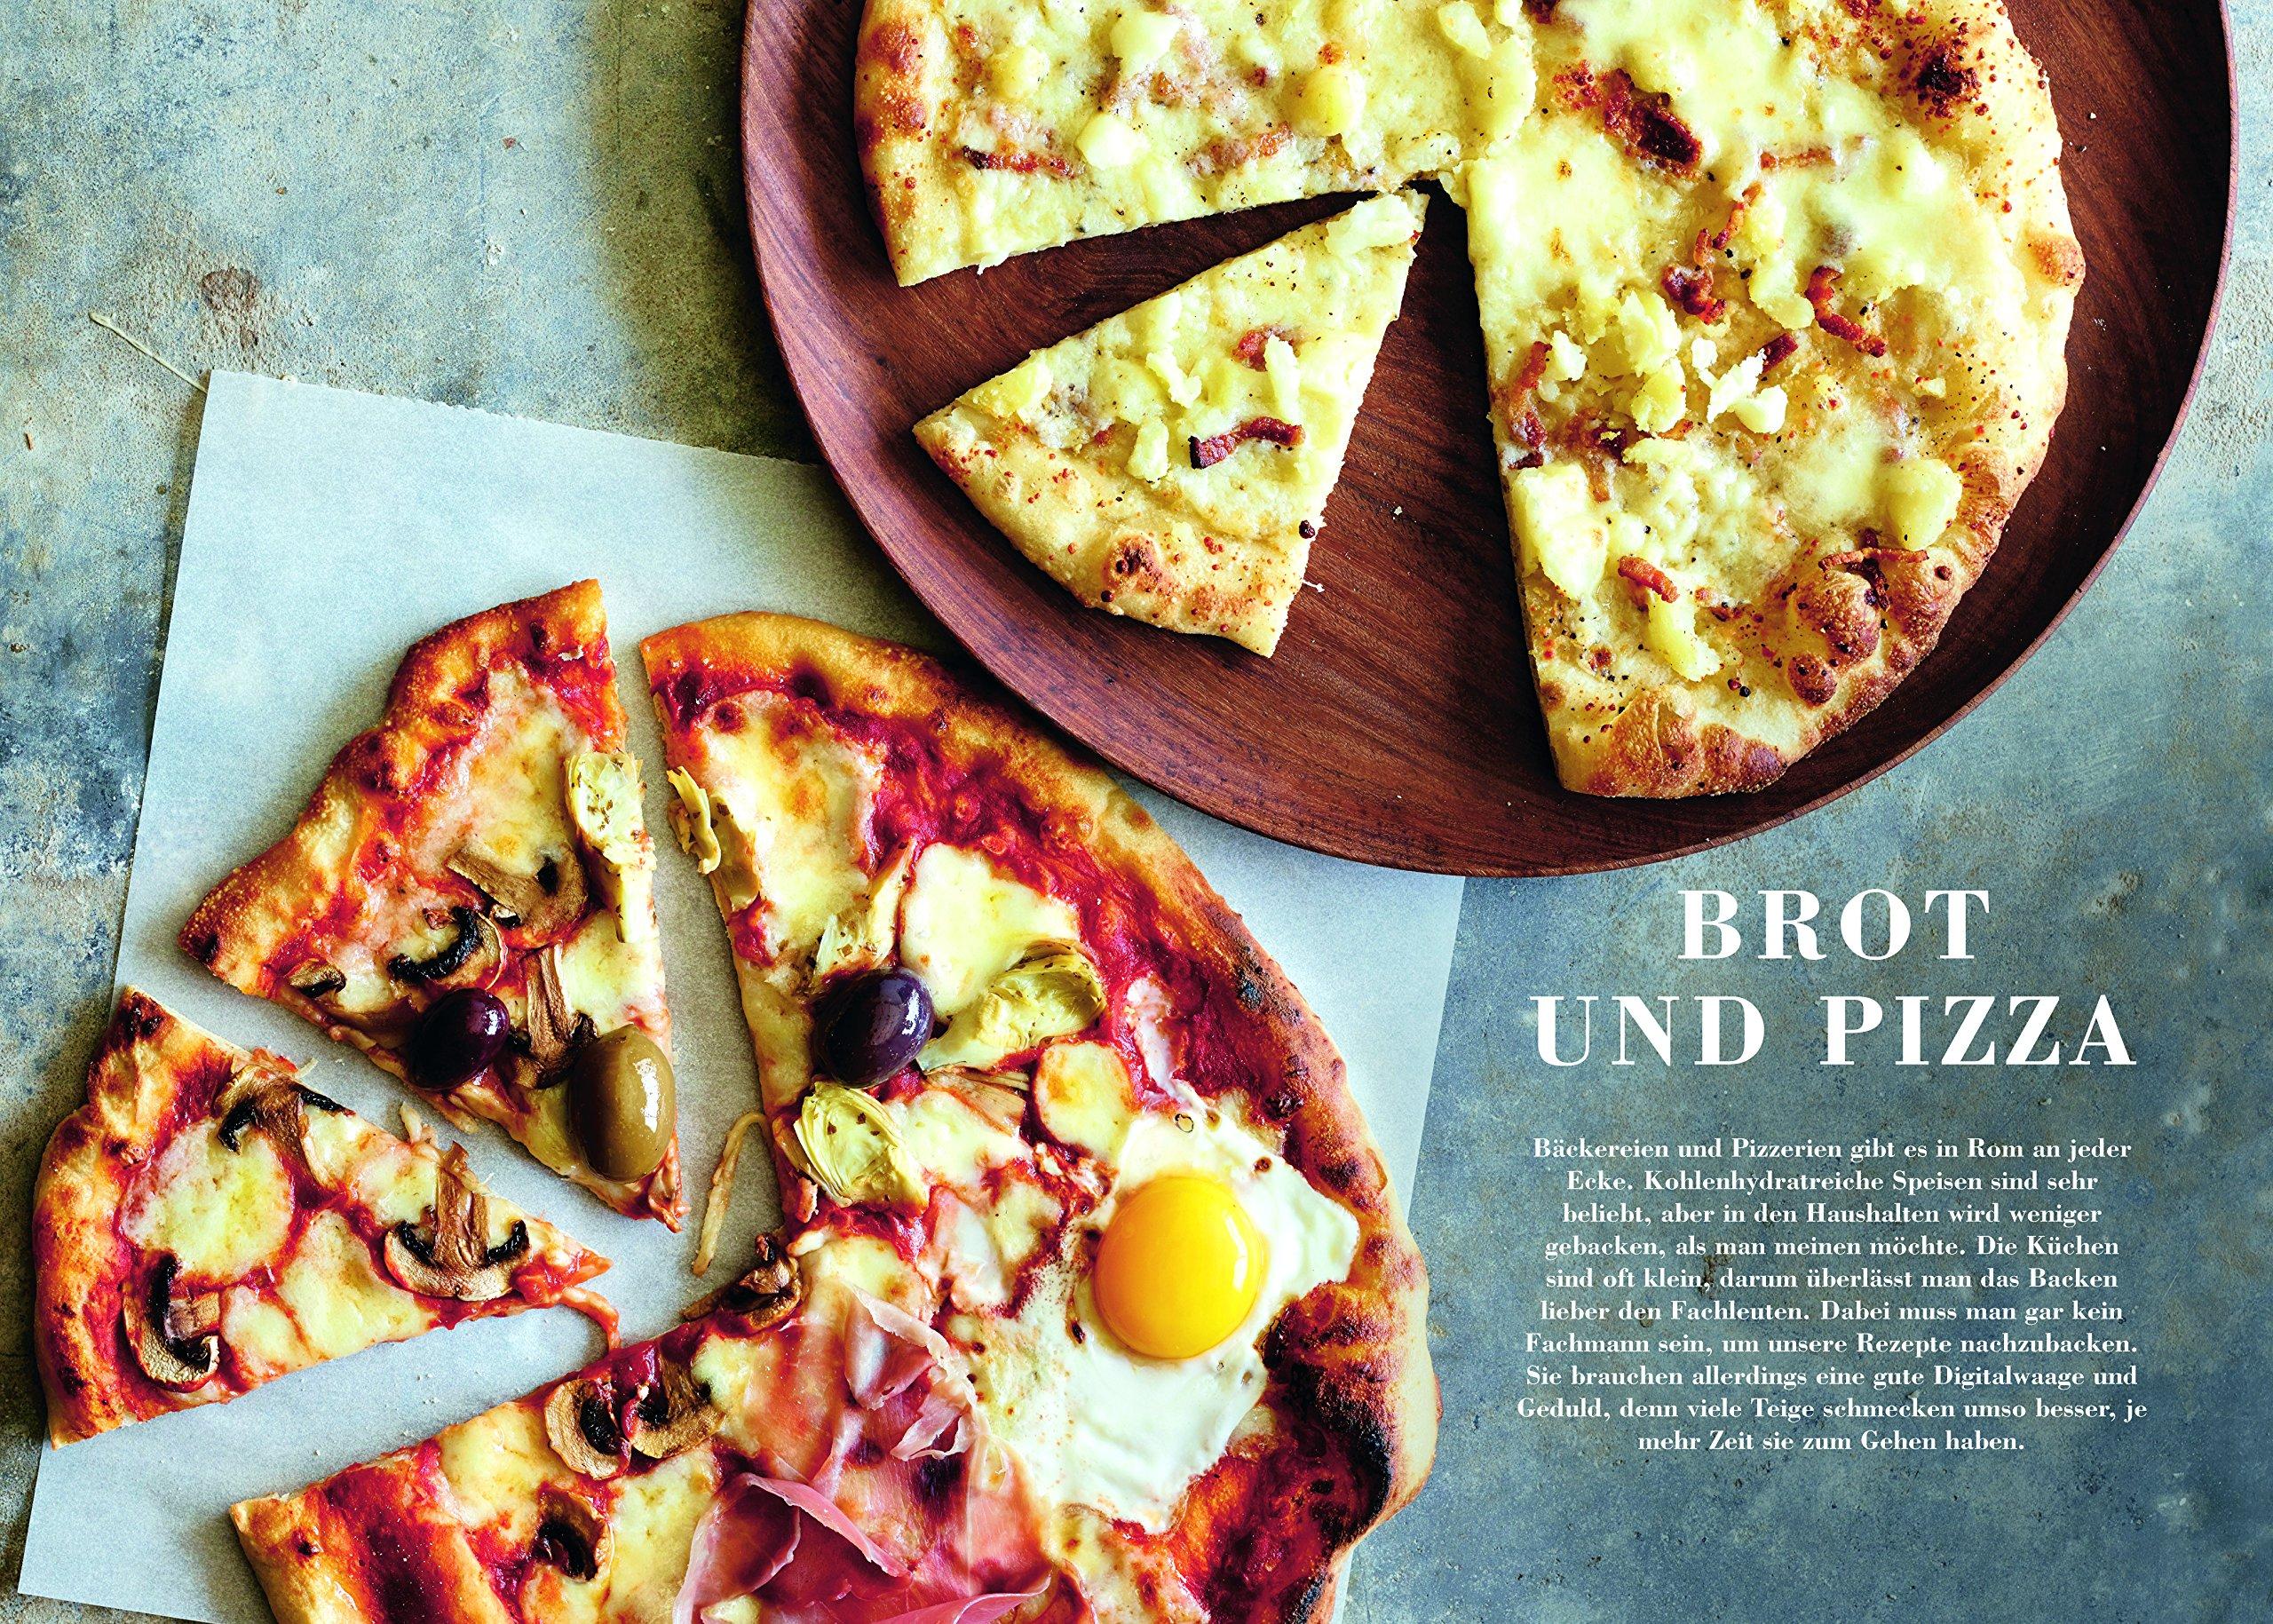 Rom Das Kochbuch 9783517095226 Amazon Com Books